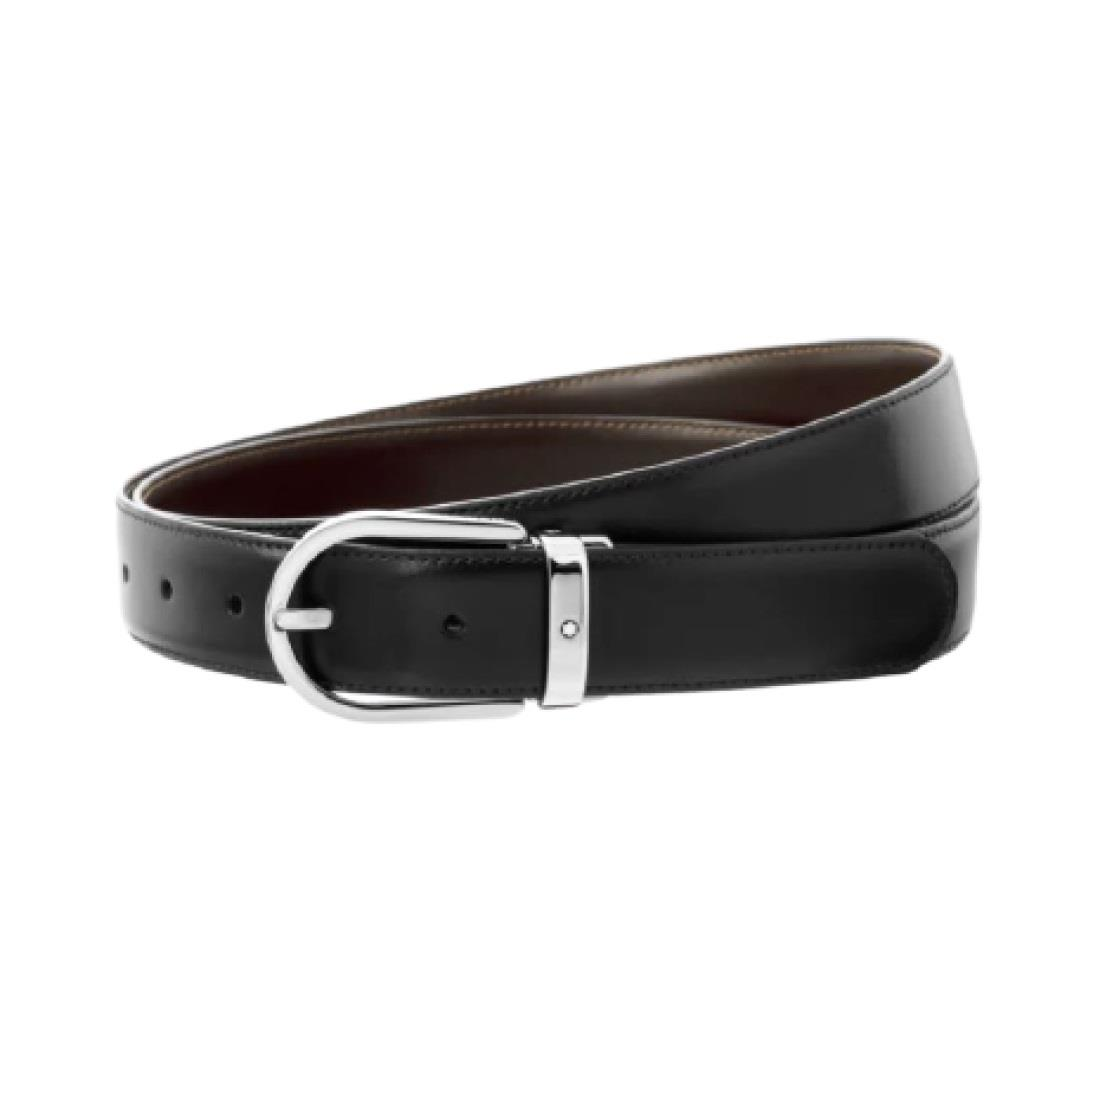 Cintura reversibile in pelle nera/marrone - MONTBLANC